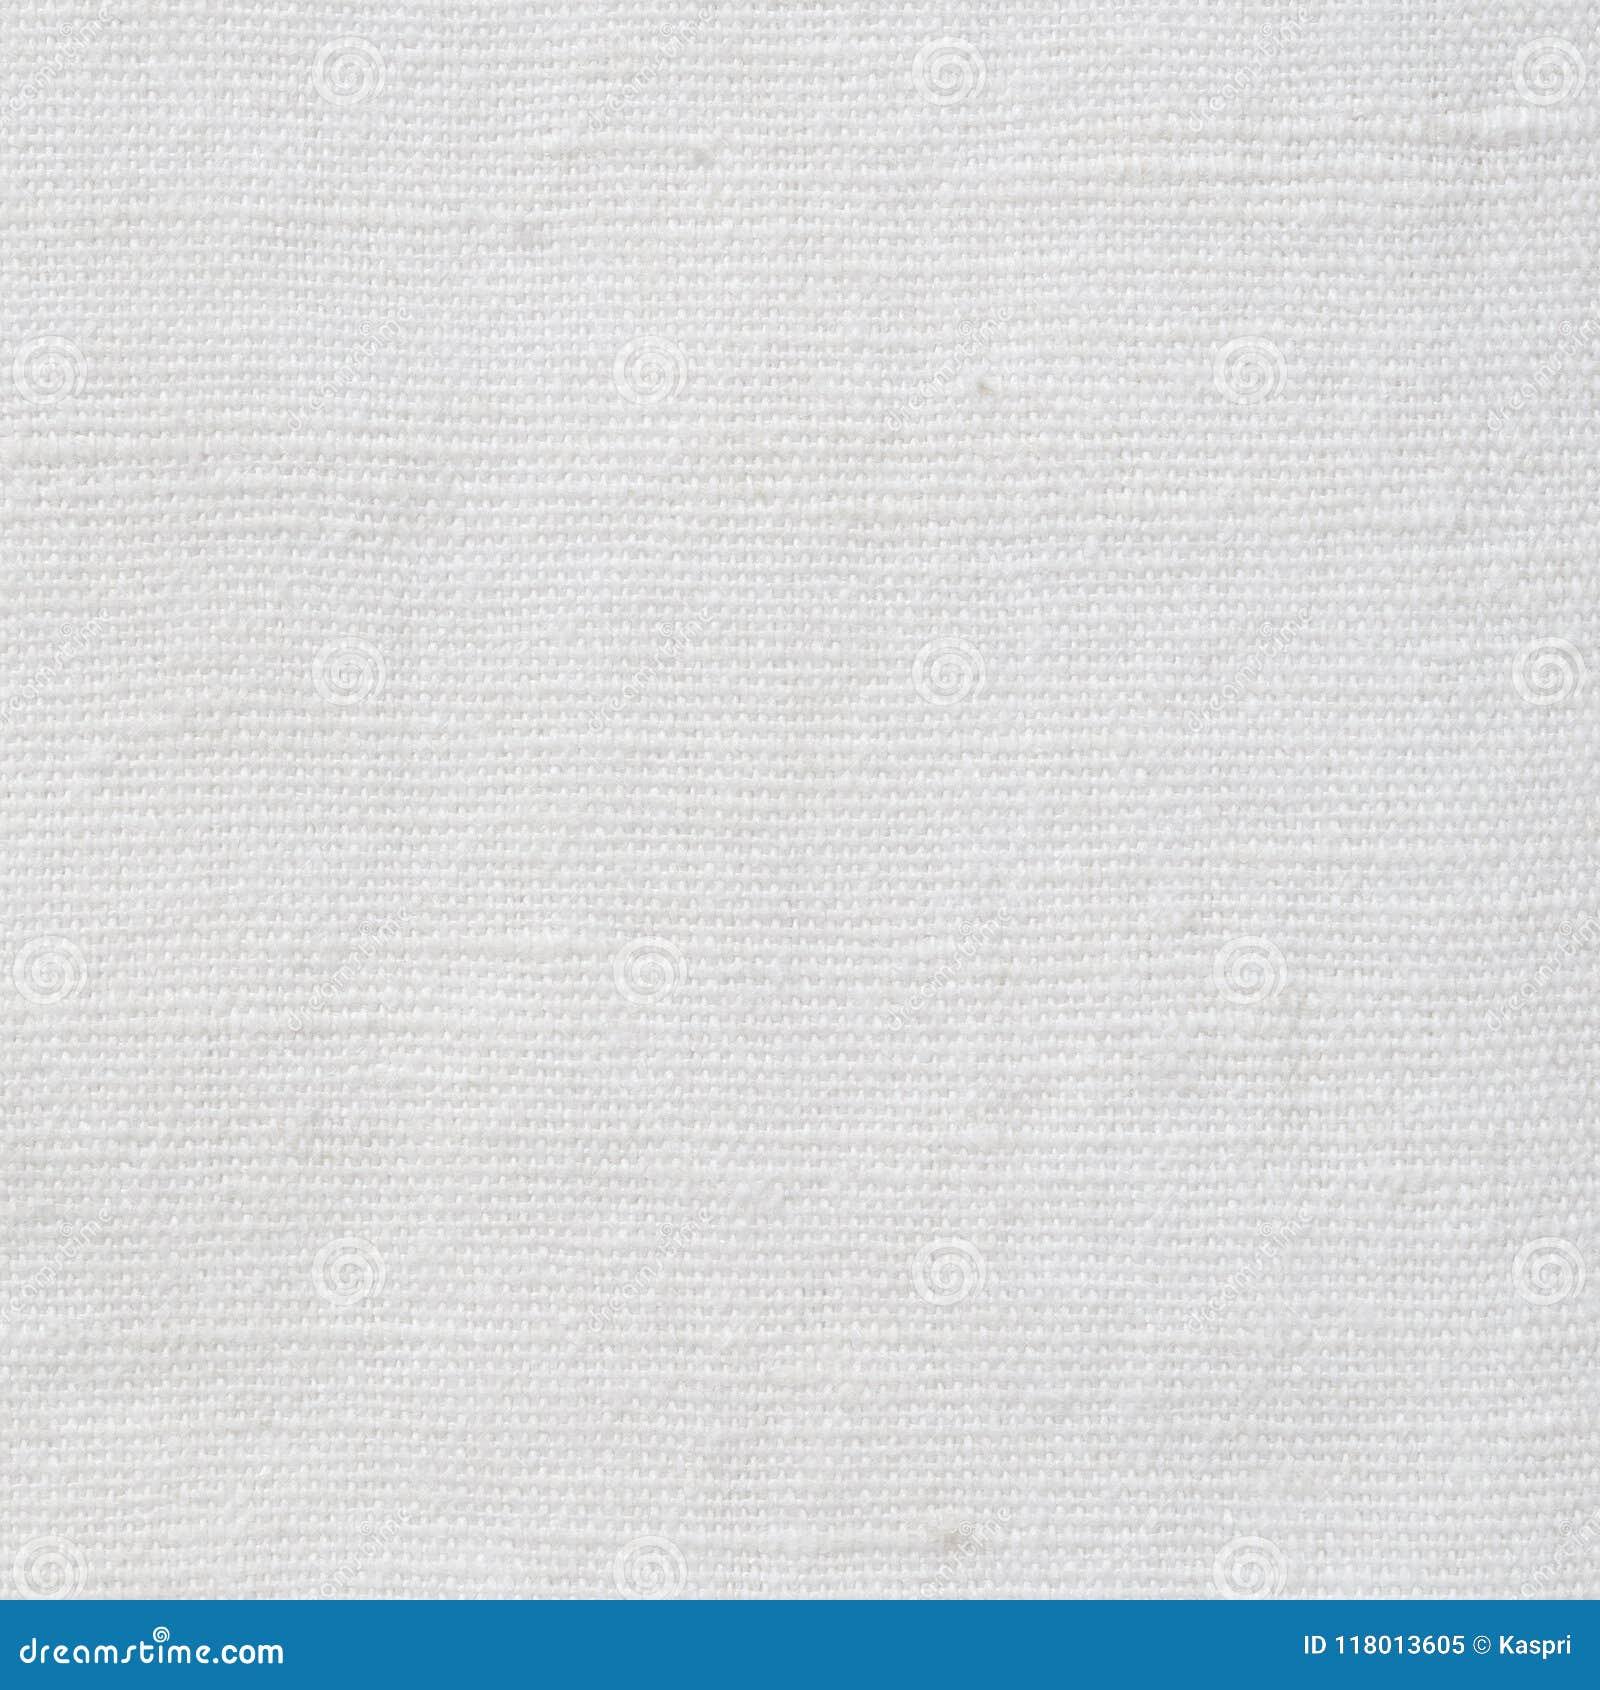 natural bright white flax fiber linen texture detailed macro closeup